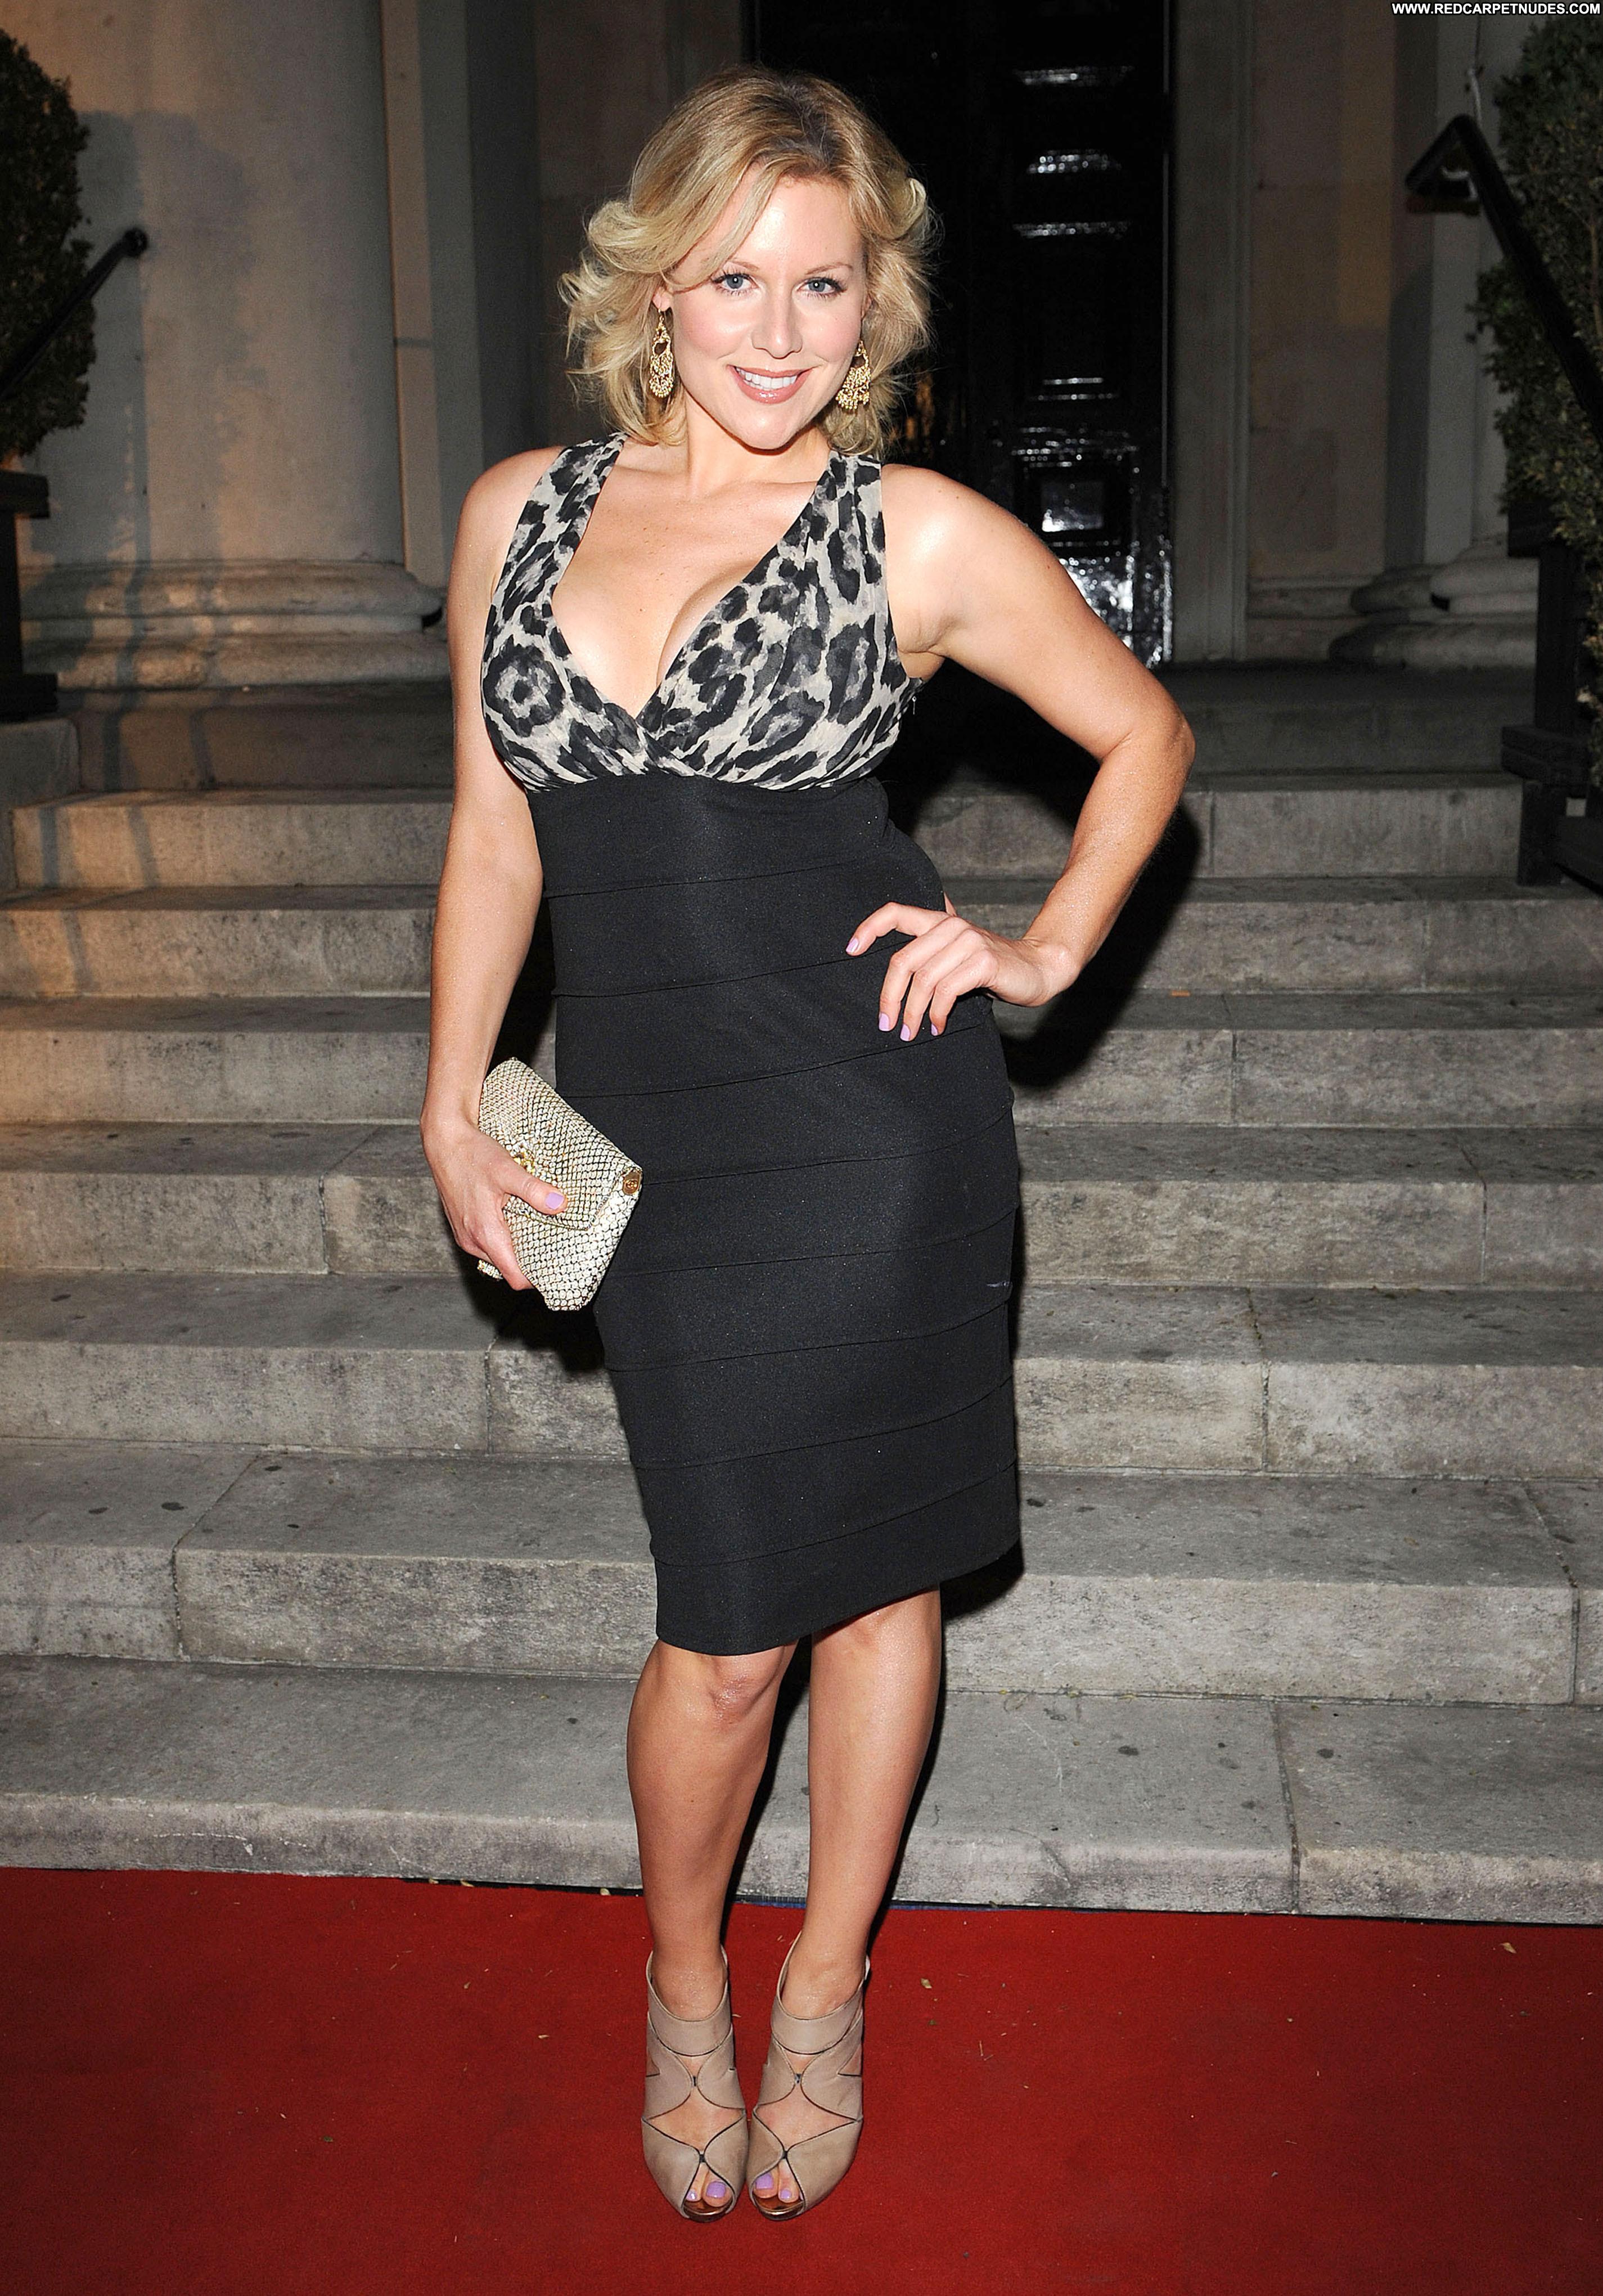 Abi Titmuss No Source Celebrity Posing Hot Babe Blonde